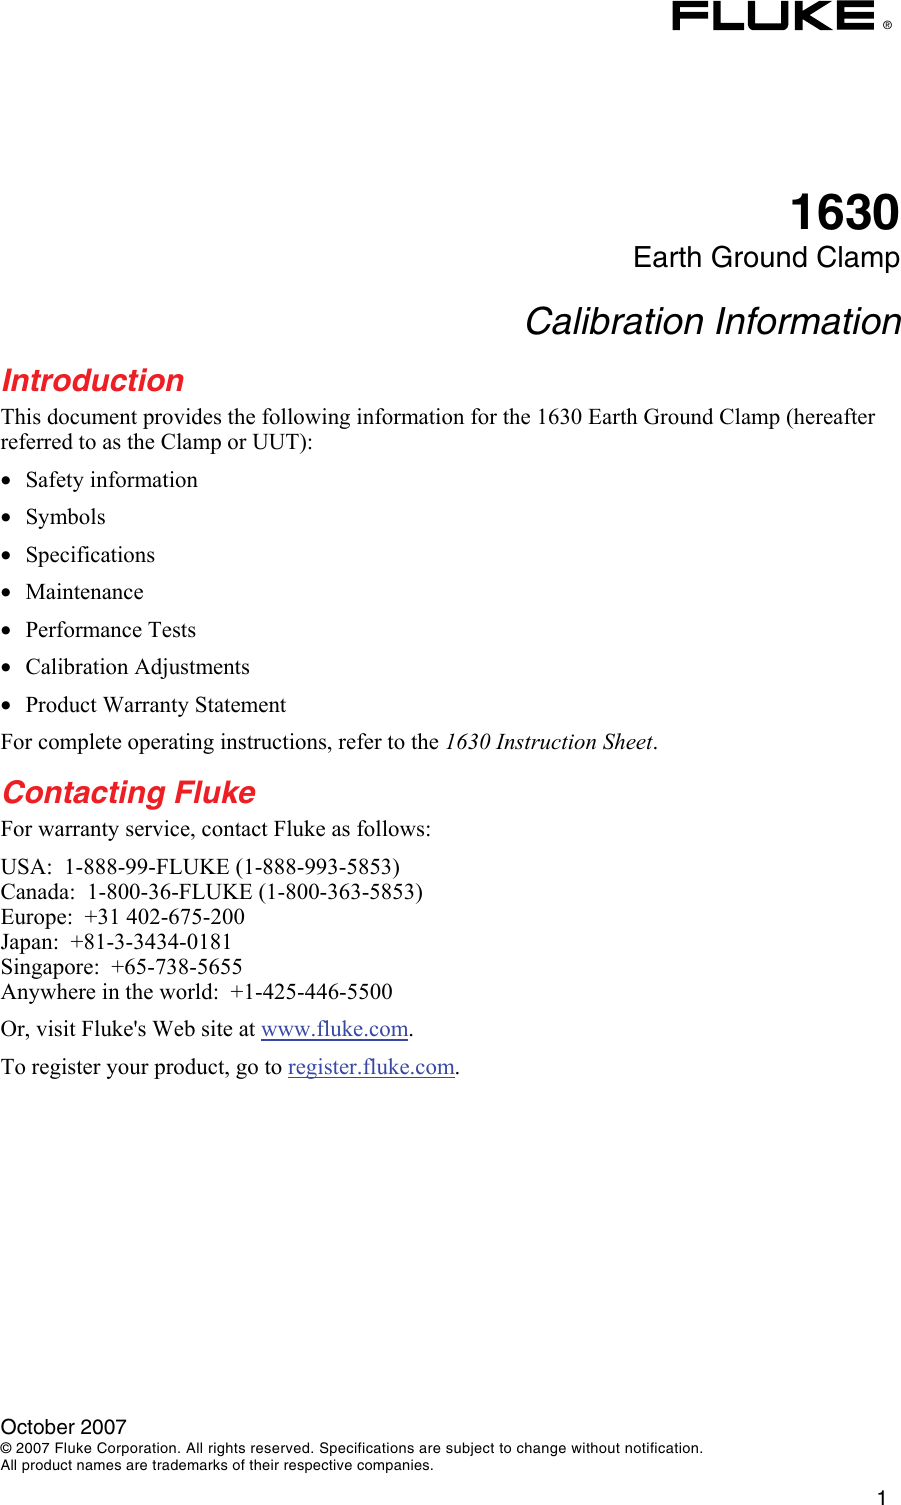 Fluke 1630 Users Manual